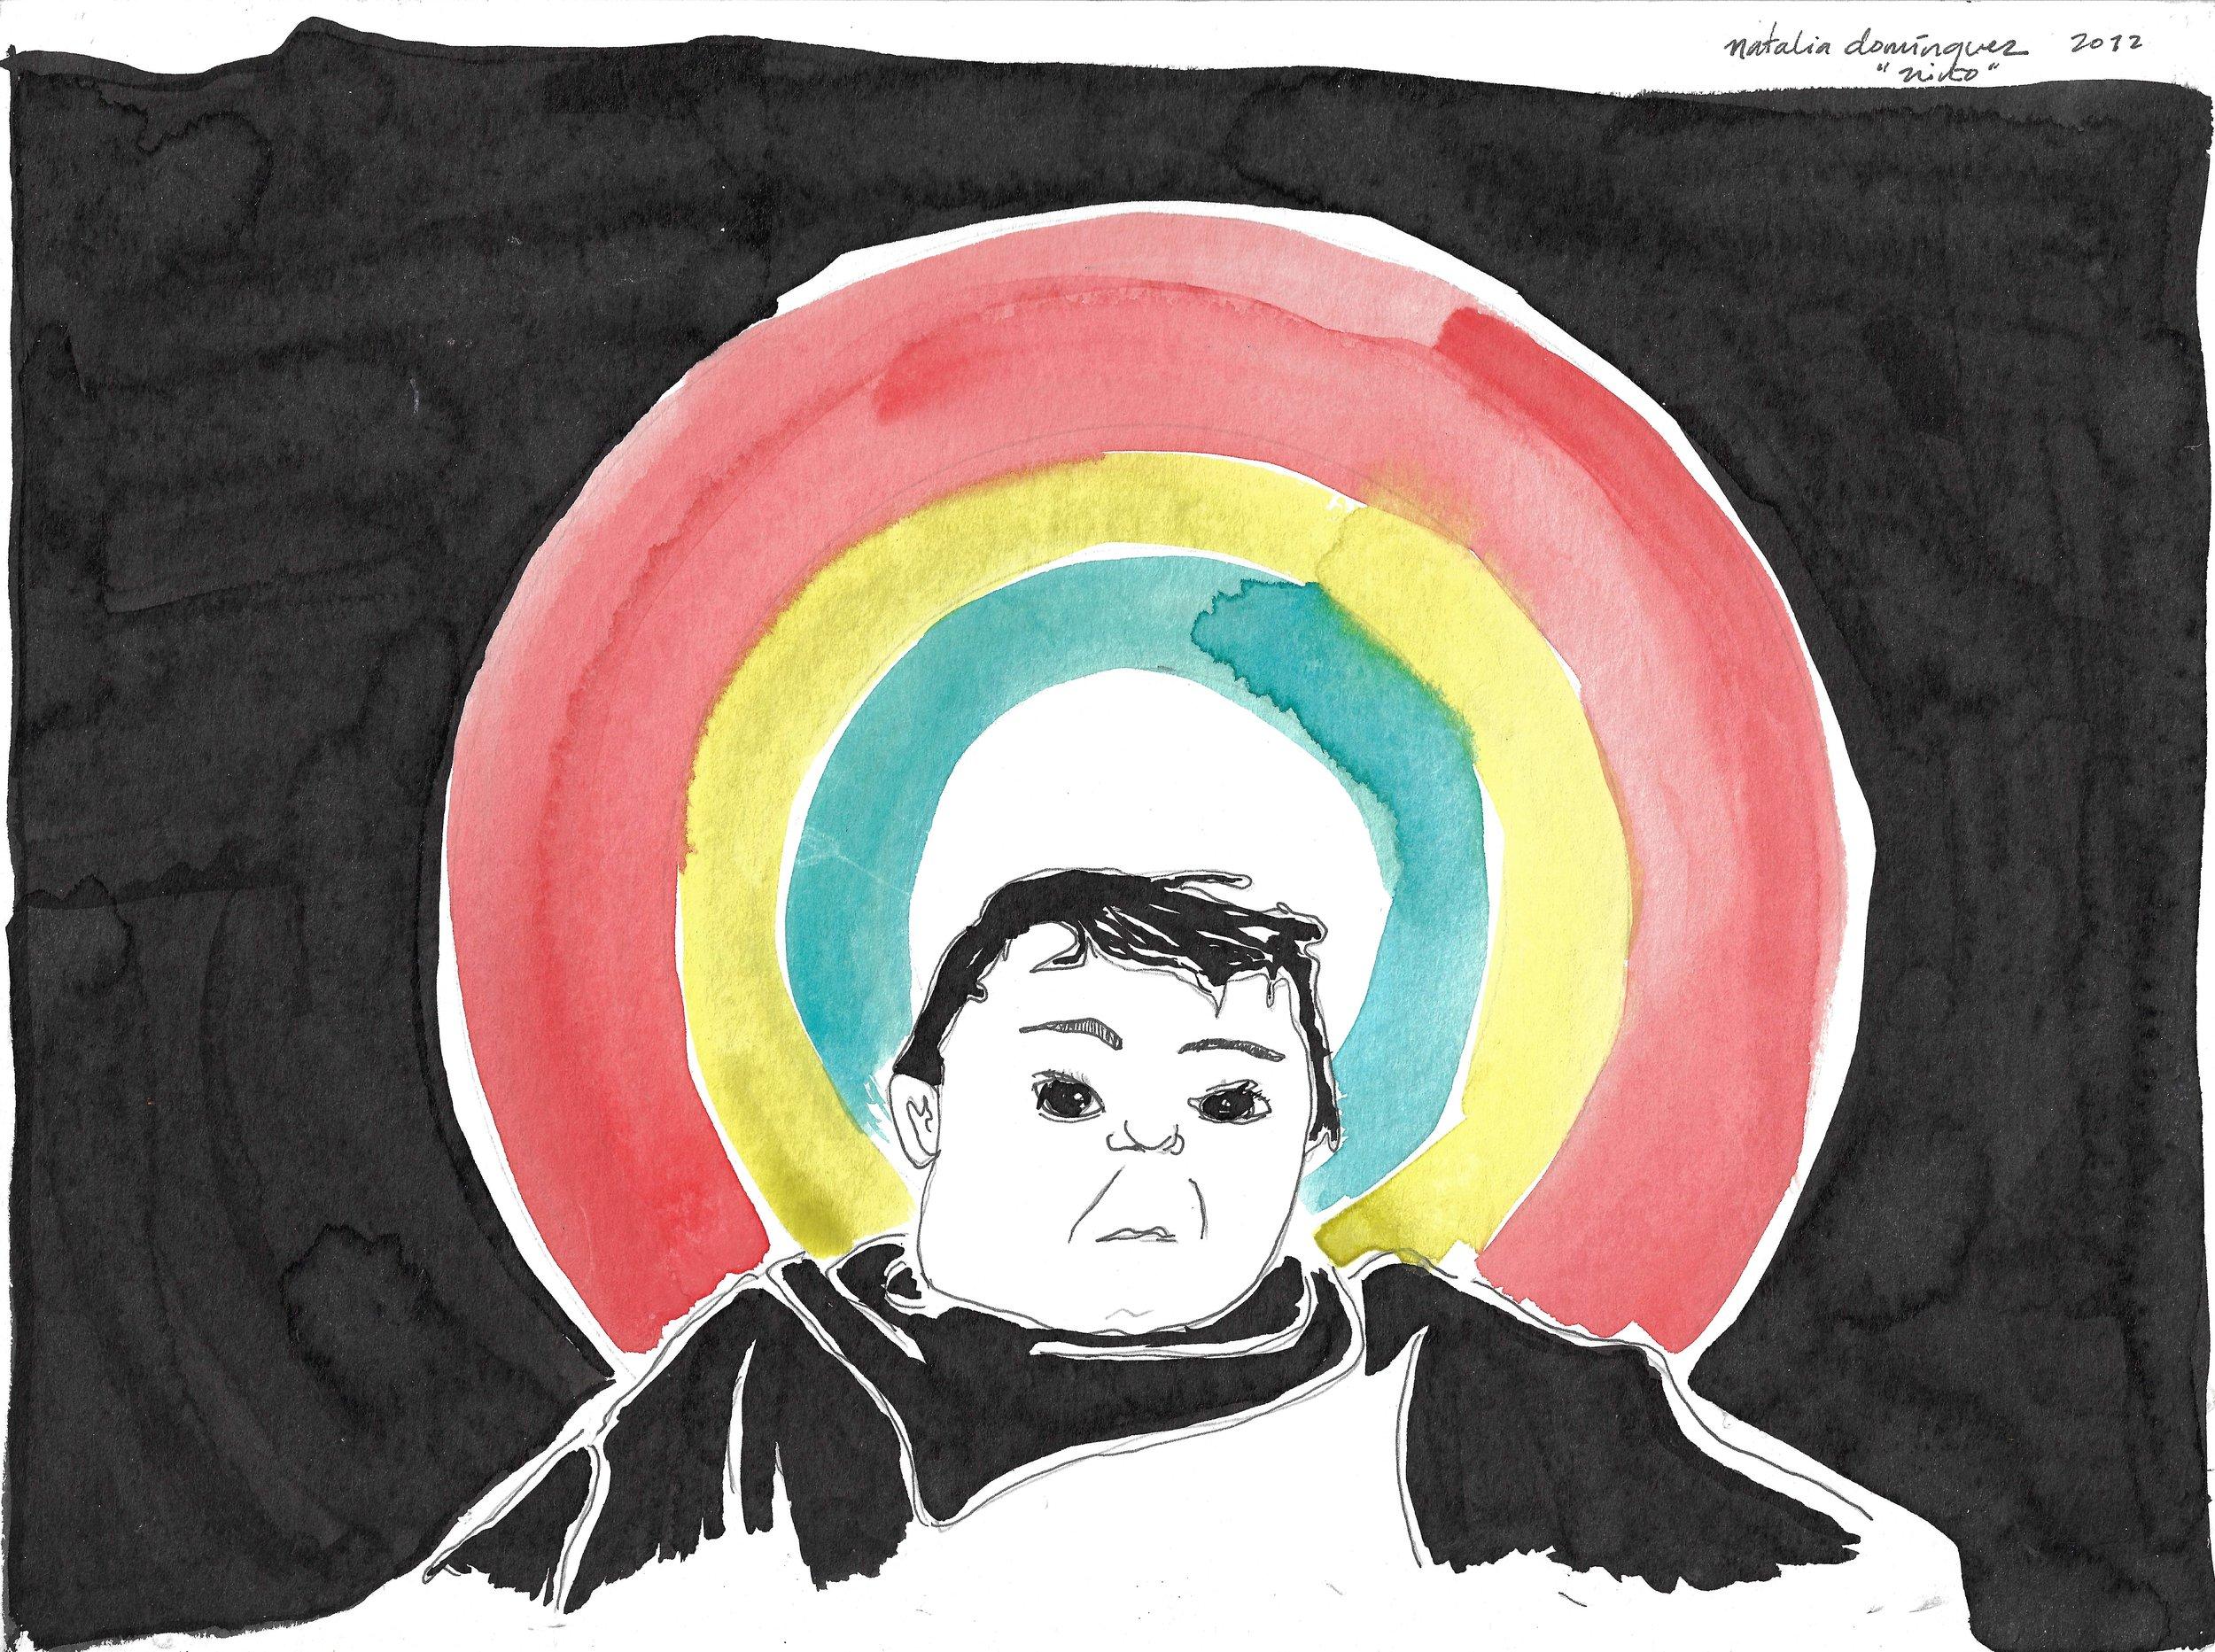 Niño santo o mi amor por ti  por  Natalia Domínguez